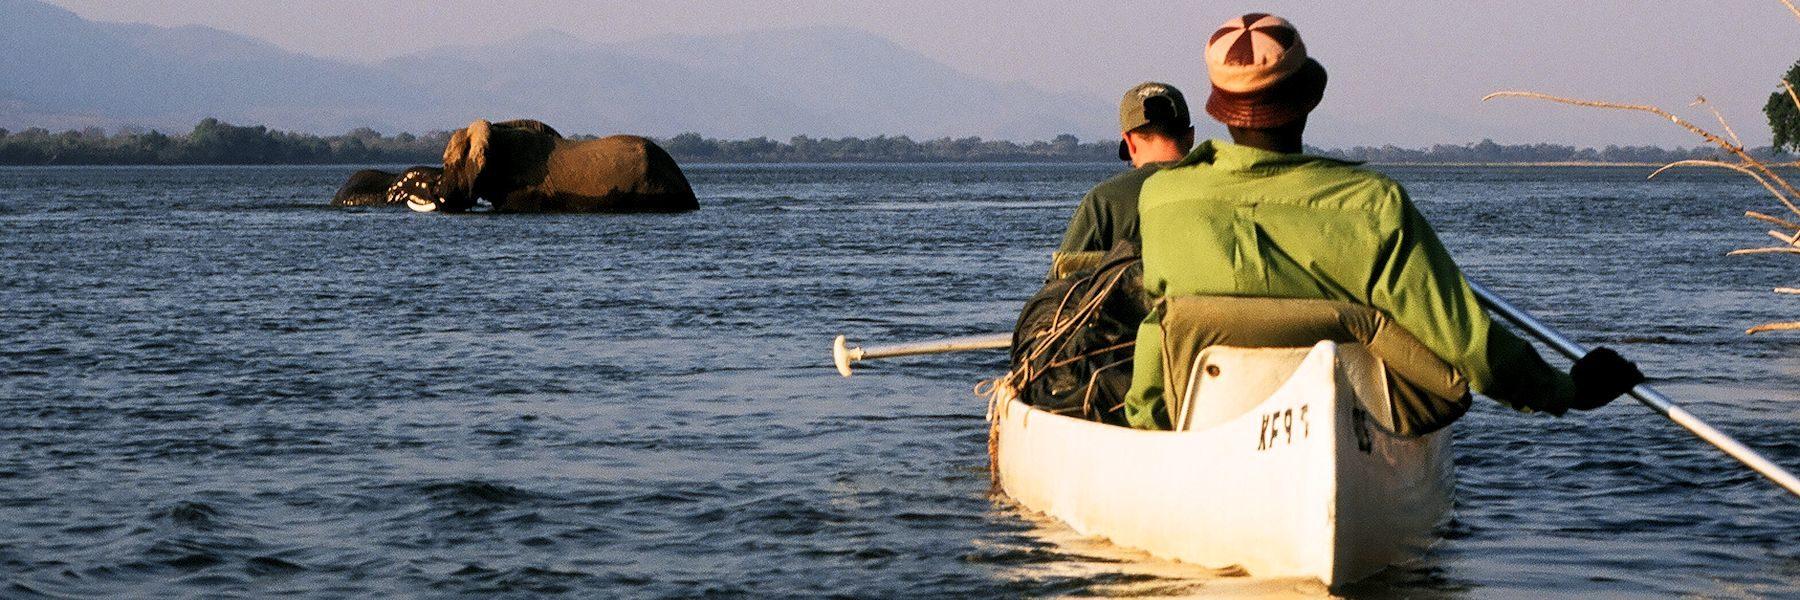 safari en canoe sur le zambeze